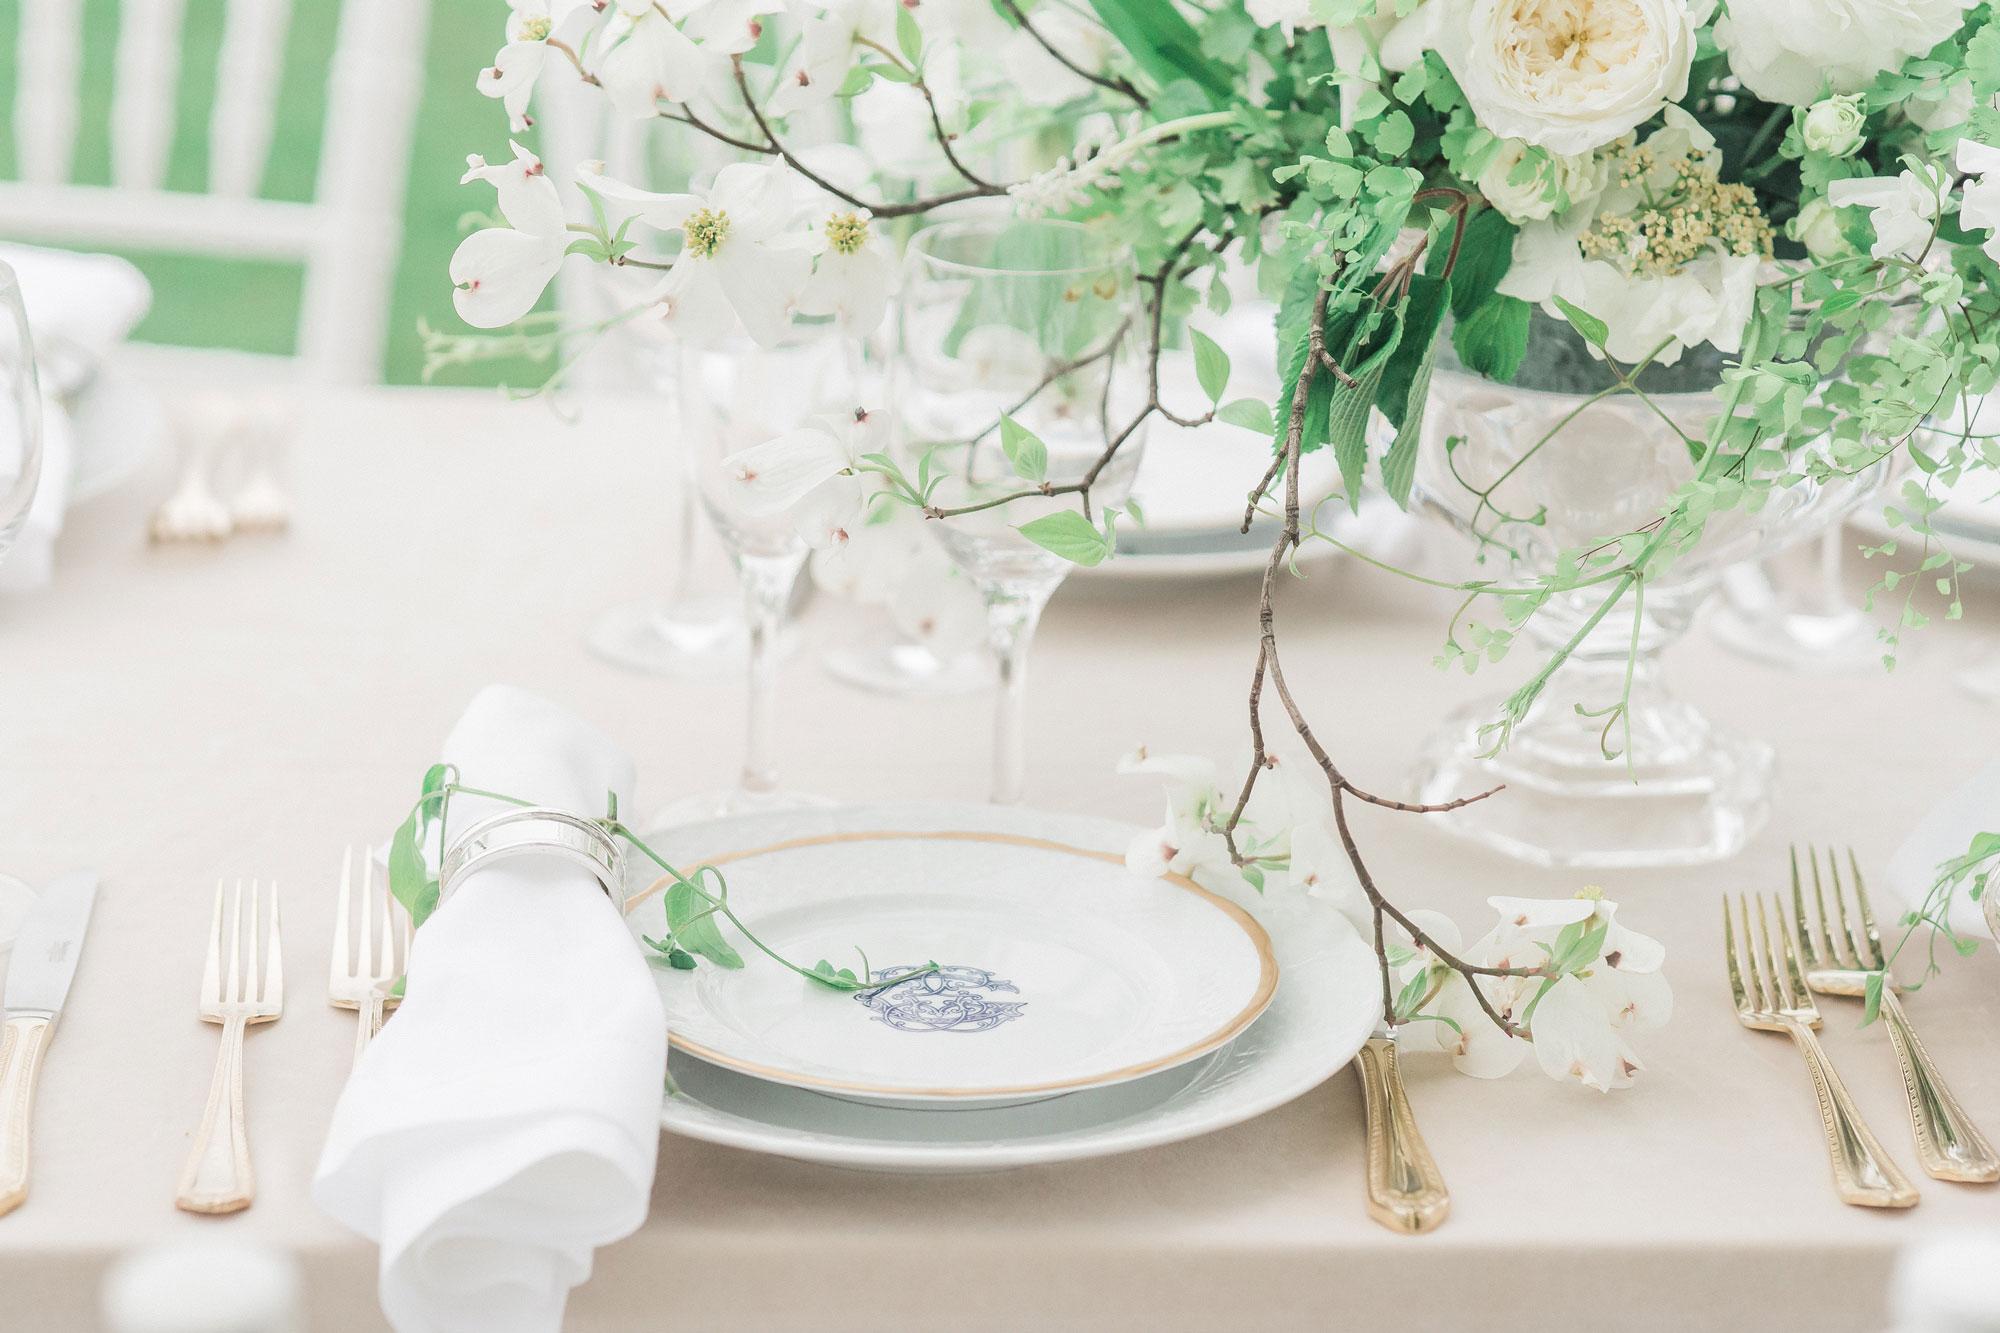 Chesapeake-Bay-Eastern-Shore-Hyatt-Chesapeake-Bay-Maryland-Wedding-Photographer-Photo-70_blog